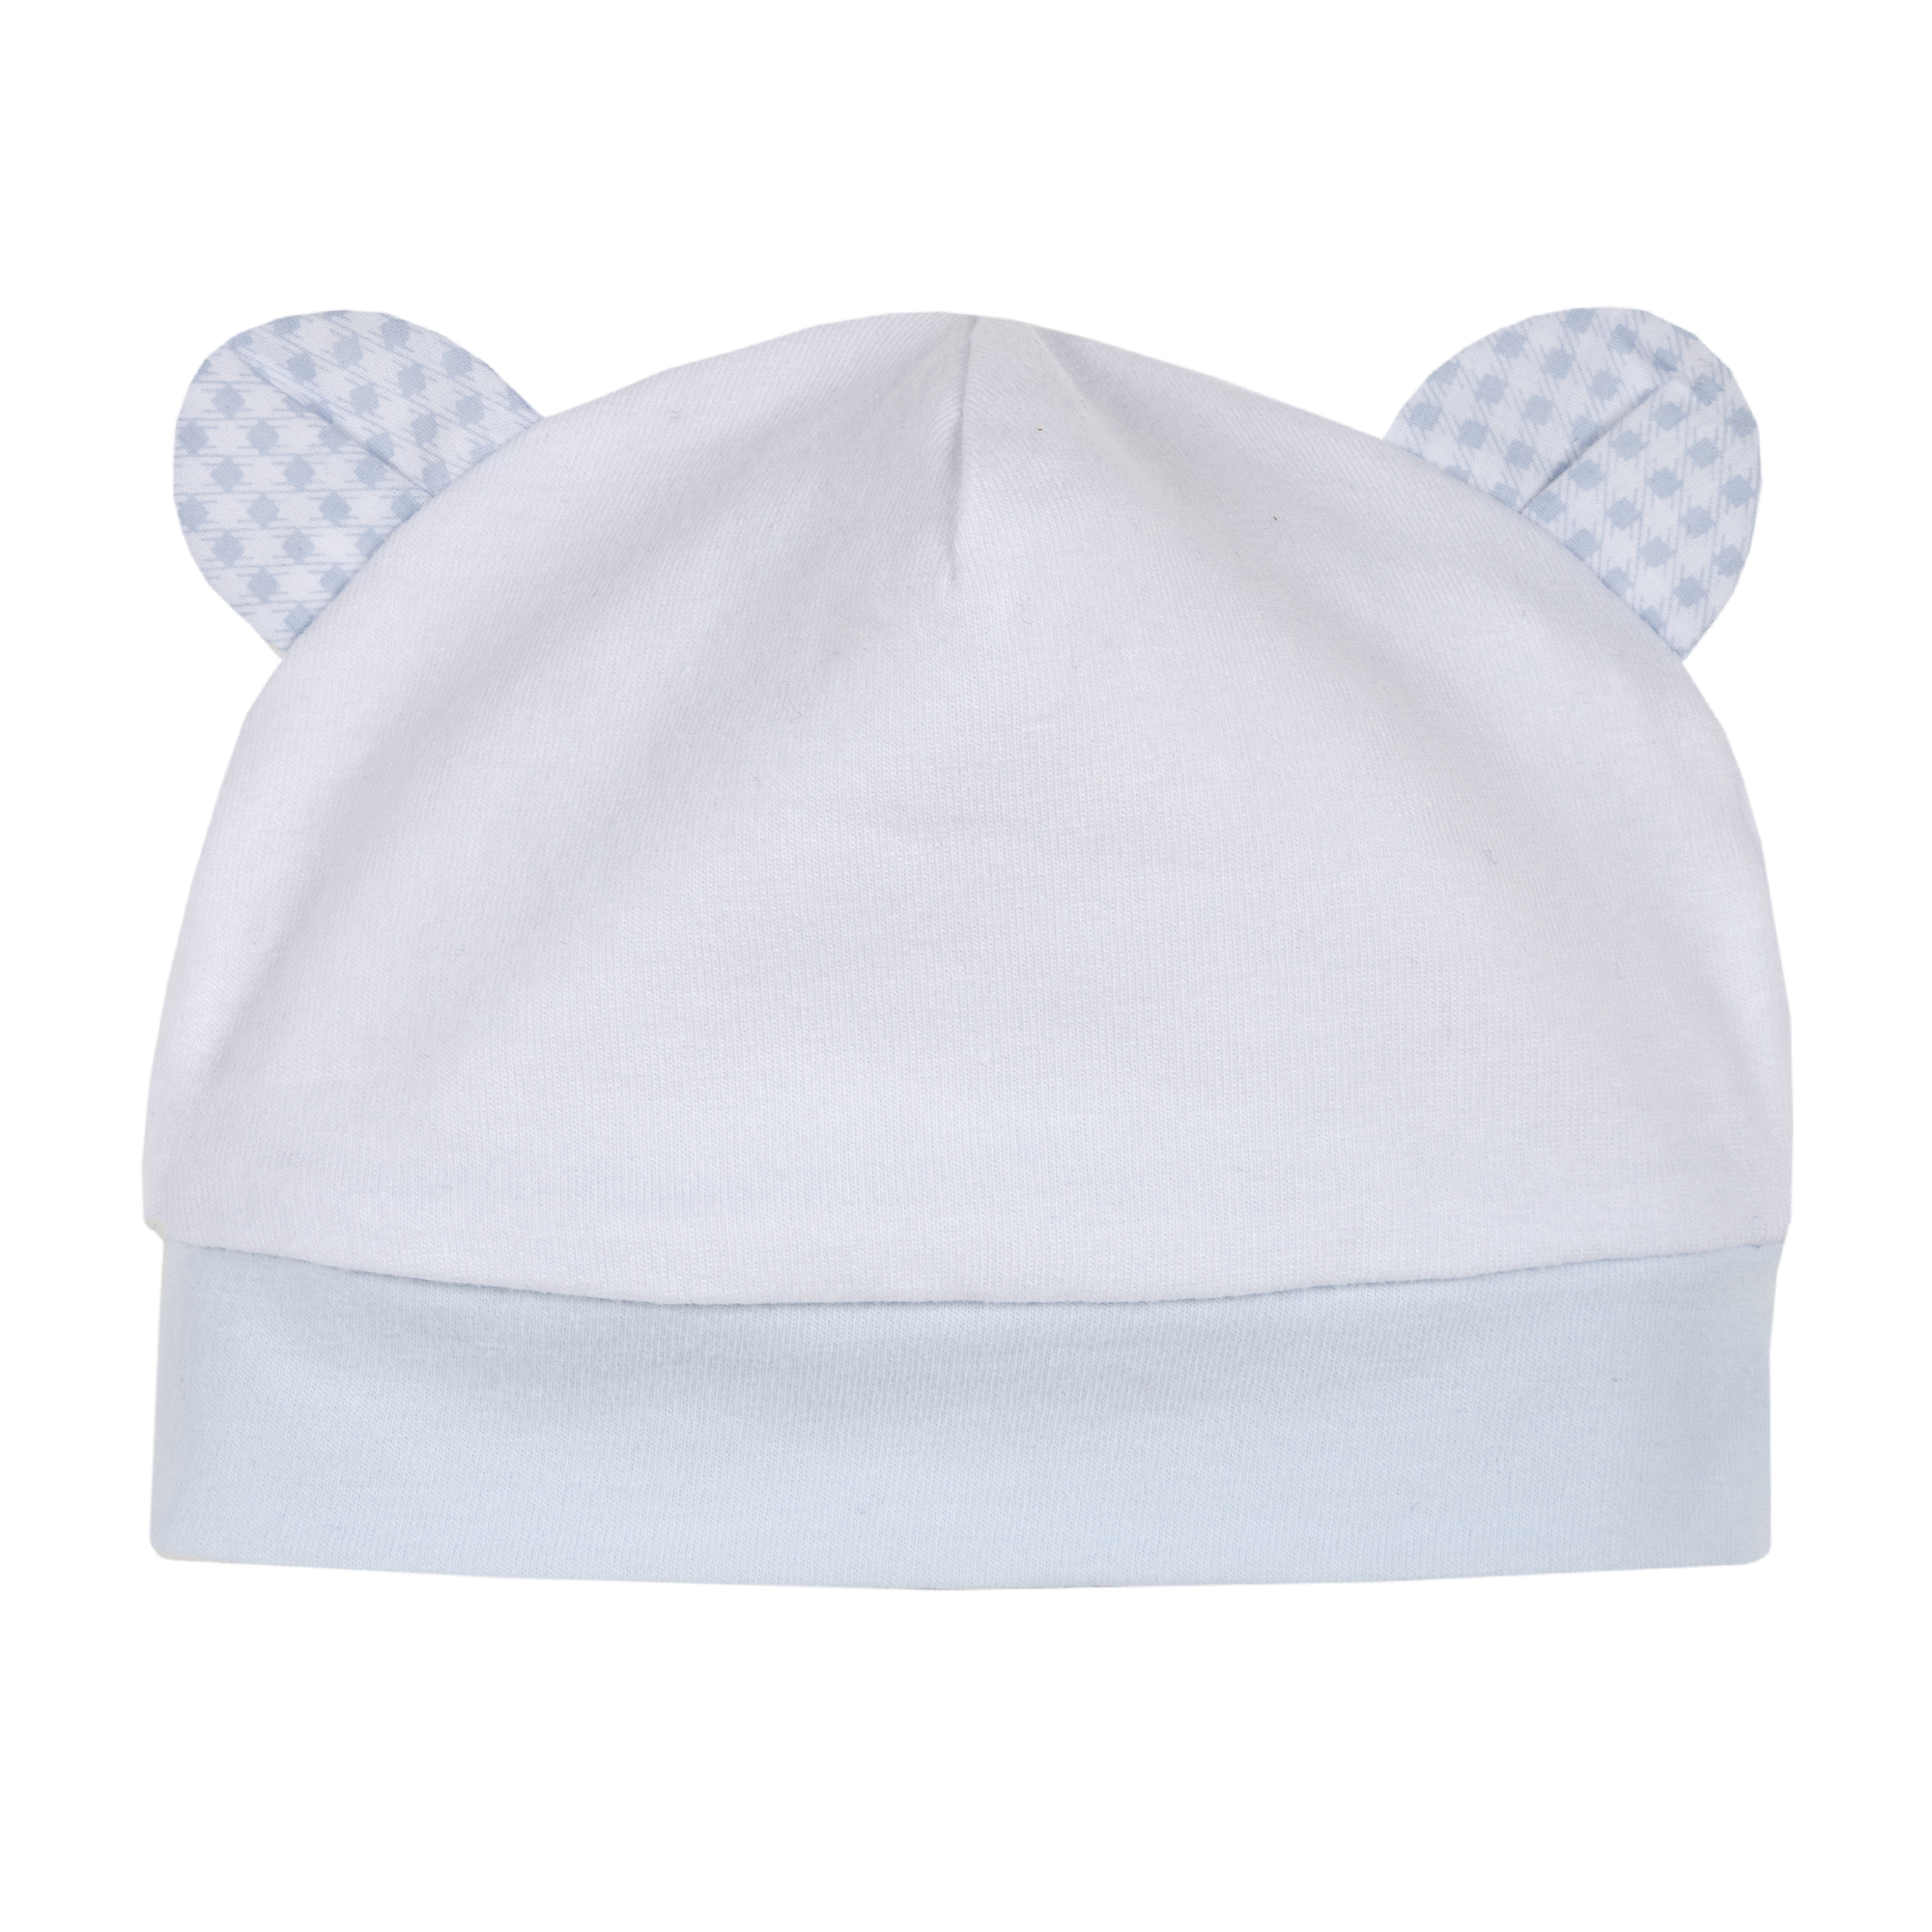 Caciulita bebe, alb cu bleu, 04384 din categoria Caciuli, Sepci